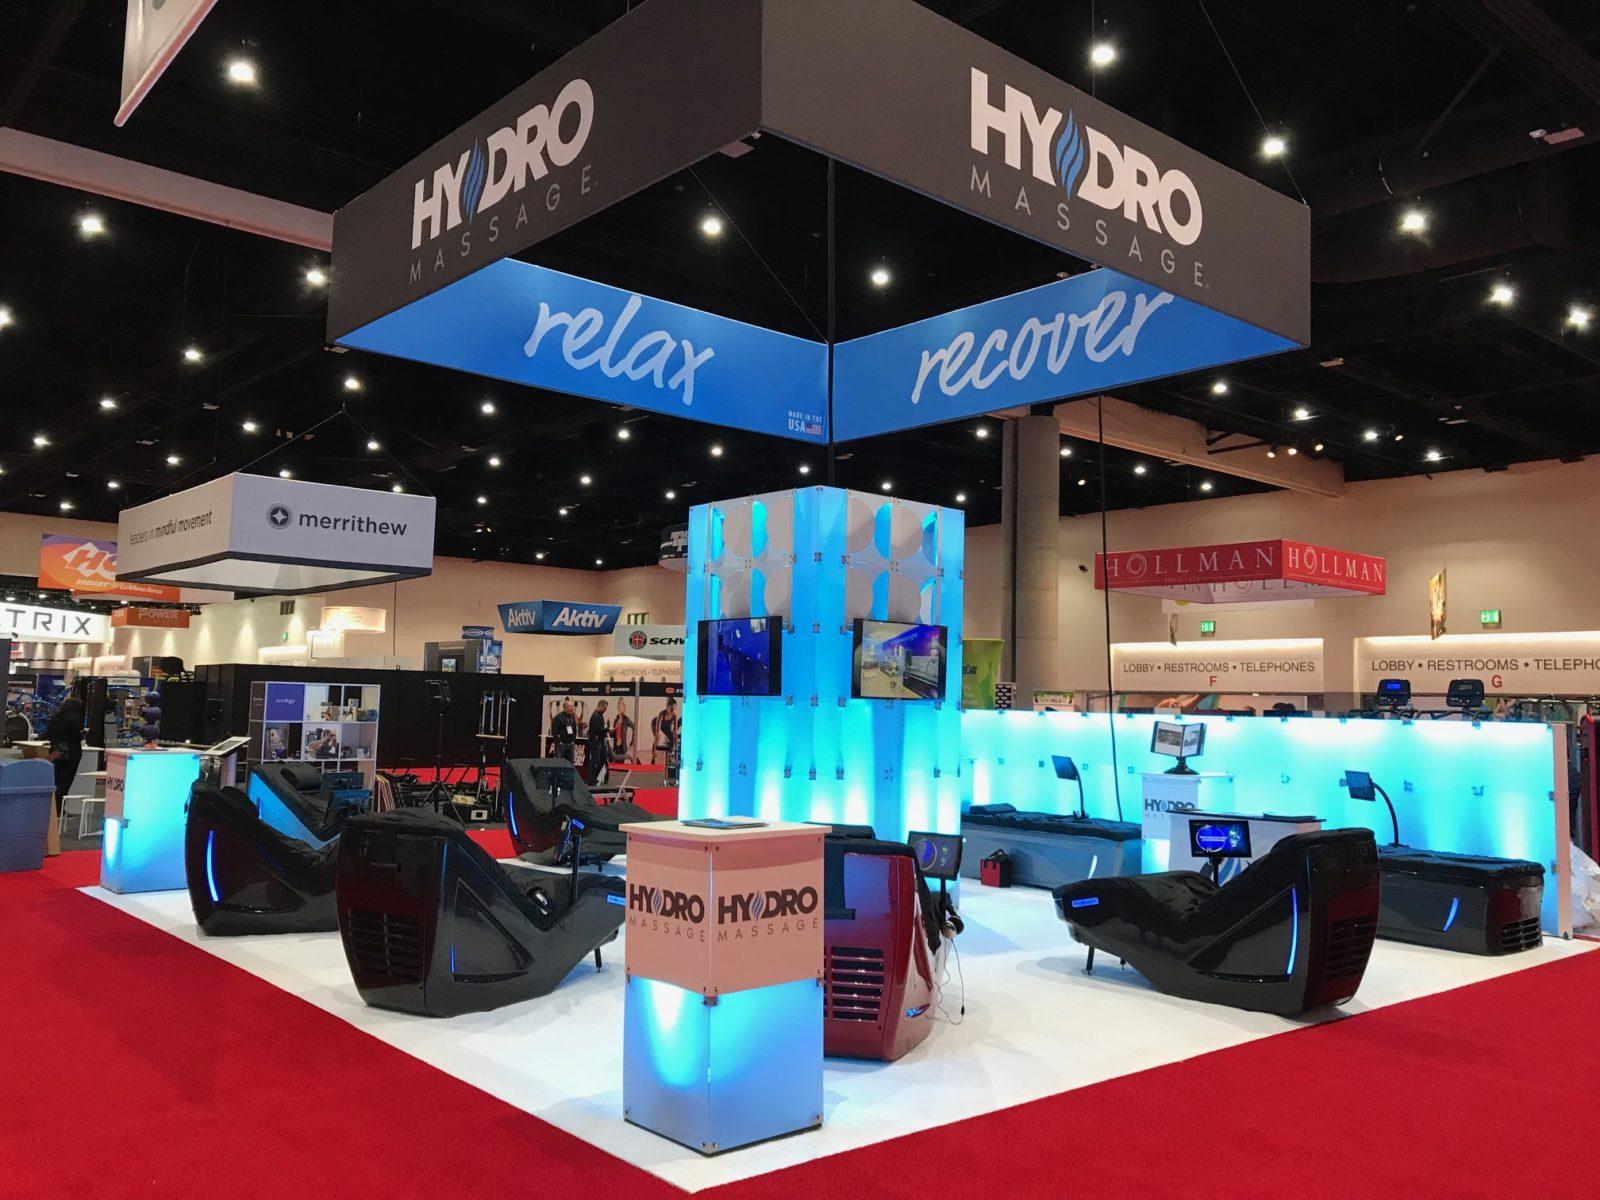 HydroMassage tradeshow booth